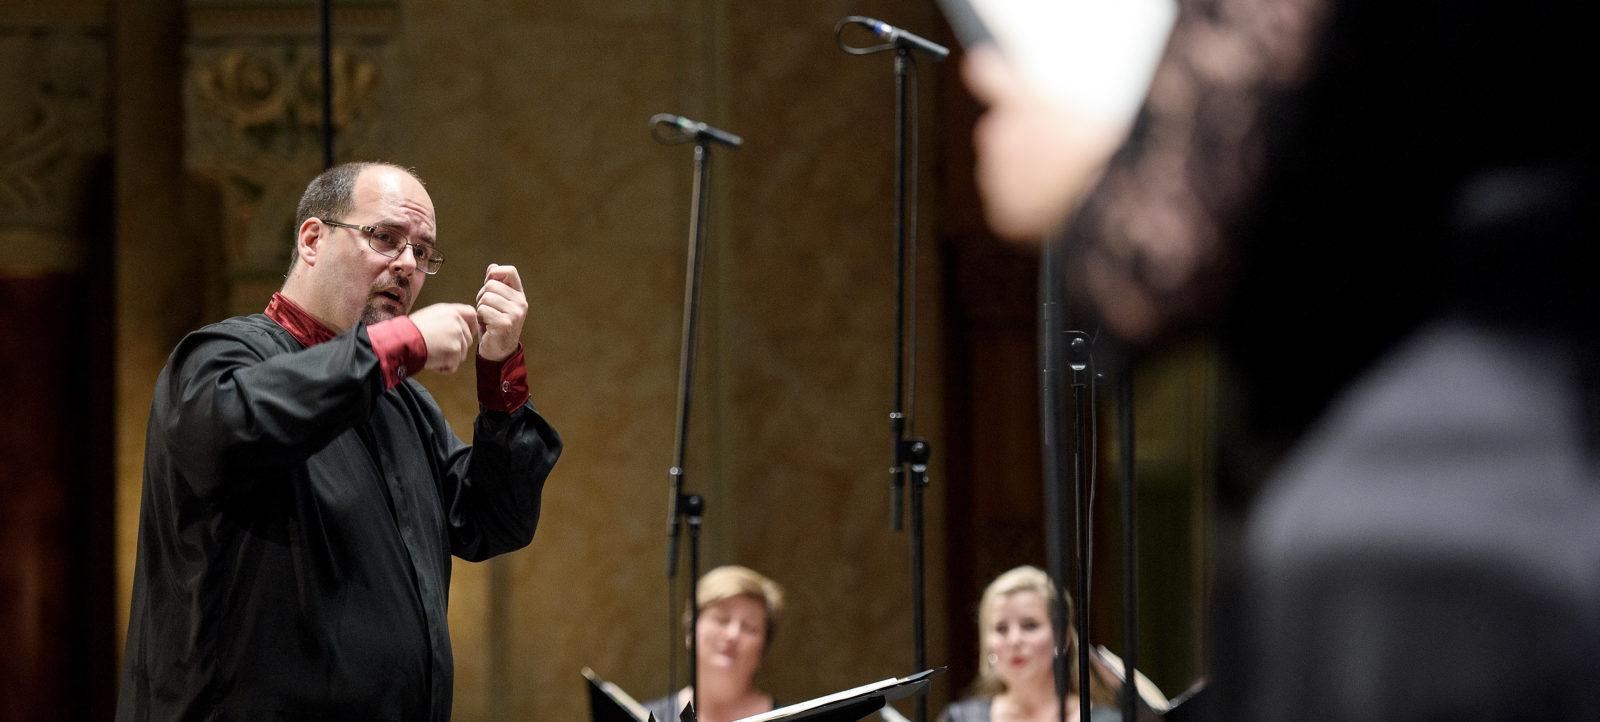 Collegium Musicum – a Nemzeti Énekkar hangversenye